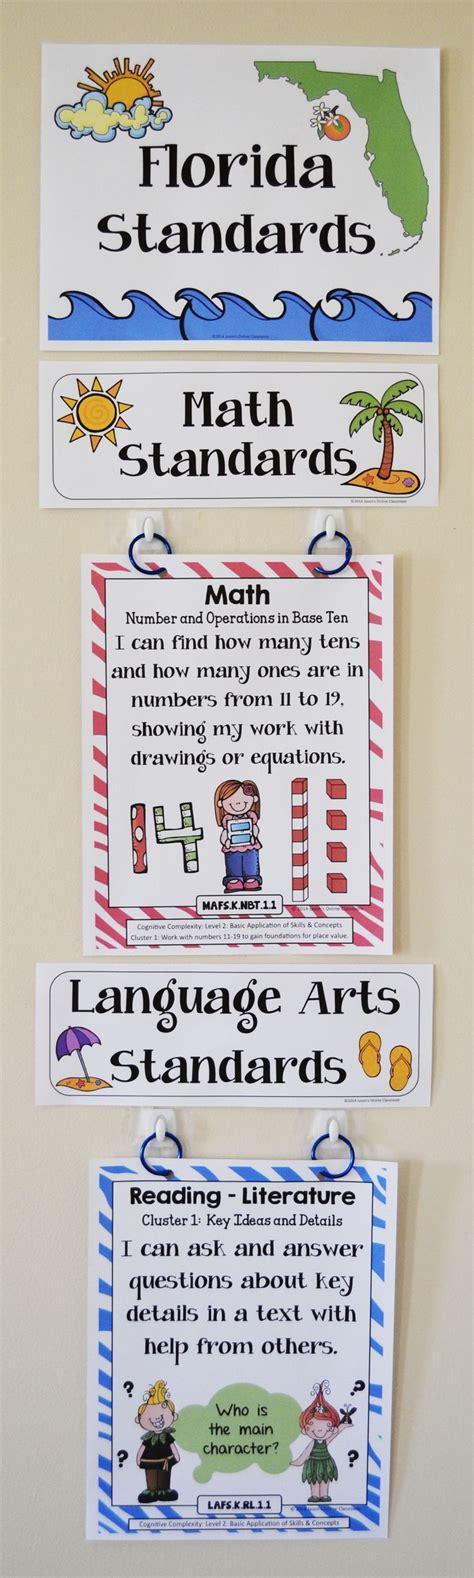 17 best ideas about maths classroom displays on 671 | 57d897ec7fe3be5e033ad7268eaf464e